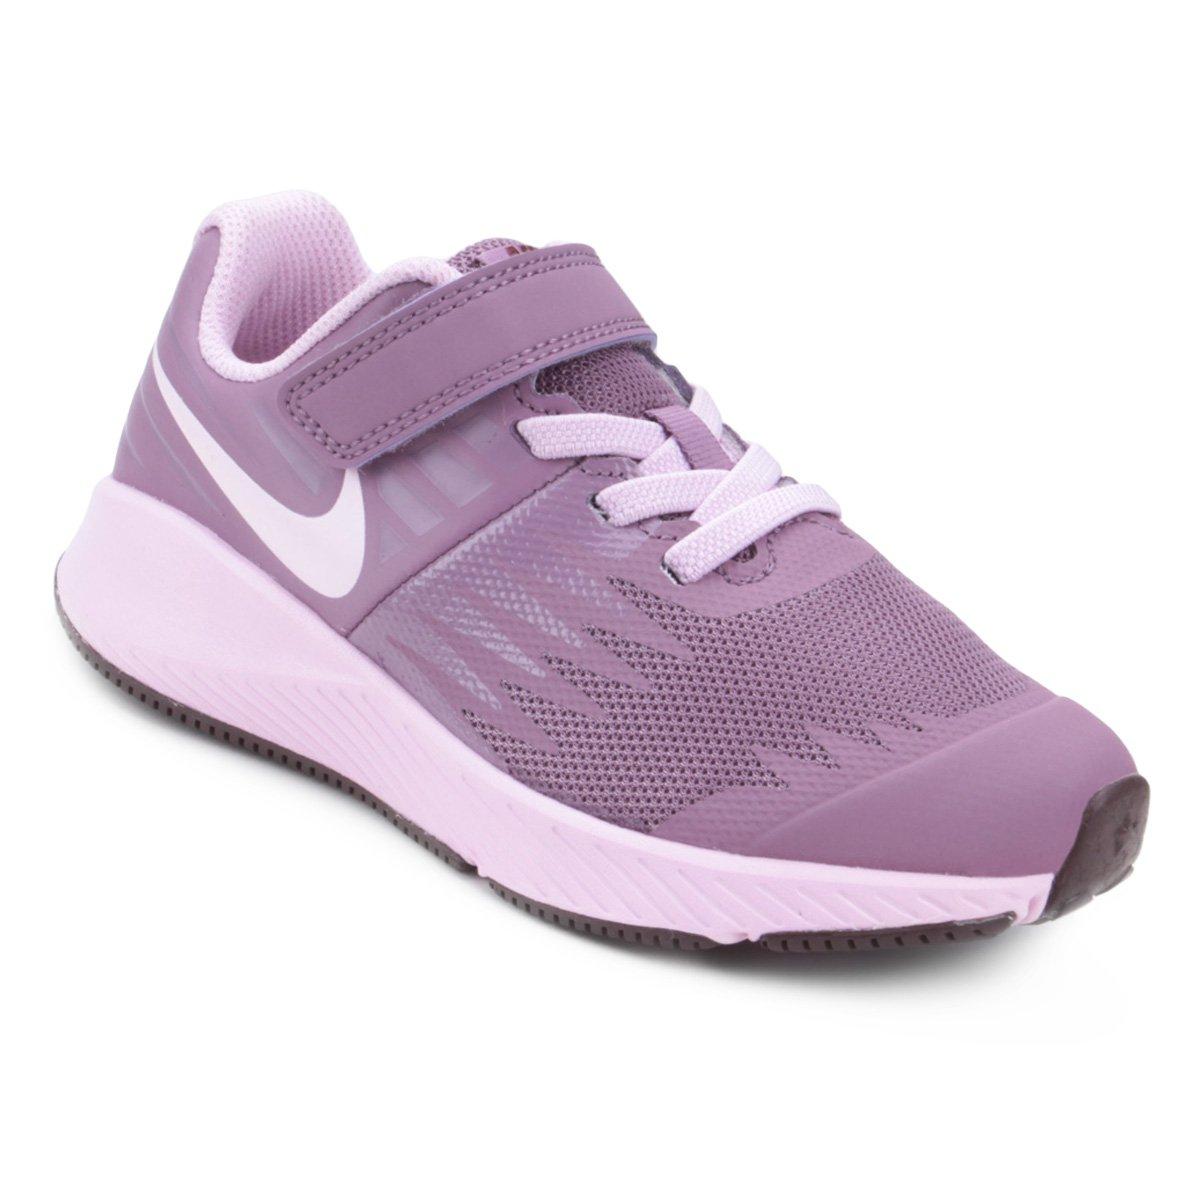 9d4be62f2ec Tênis Infantil Nike Star Runner Feminino - Compre Agora